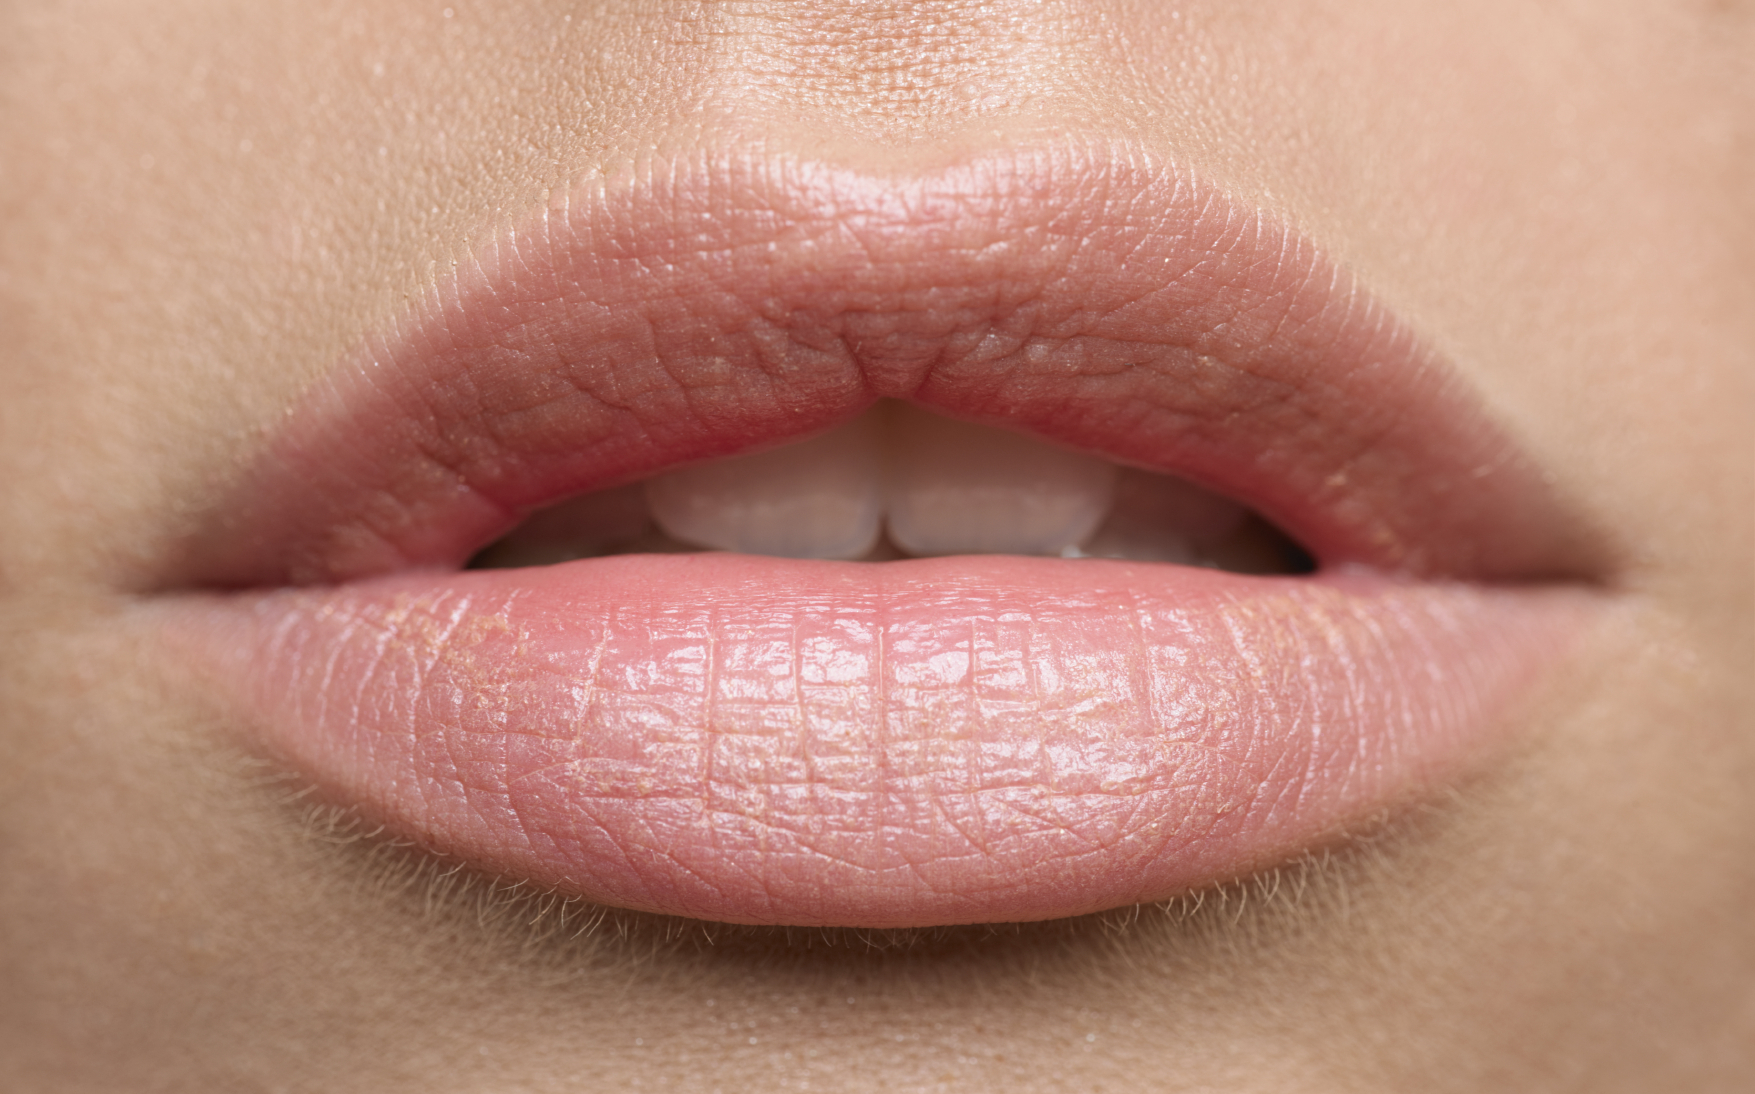 Lips for Life – Lip implants